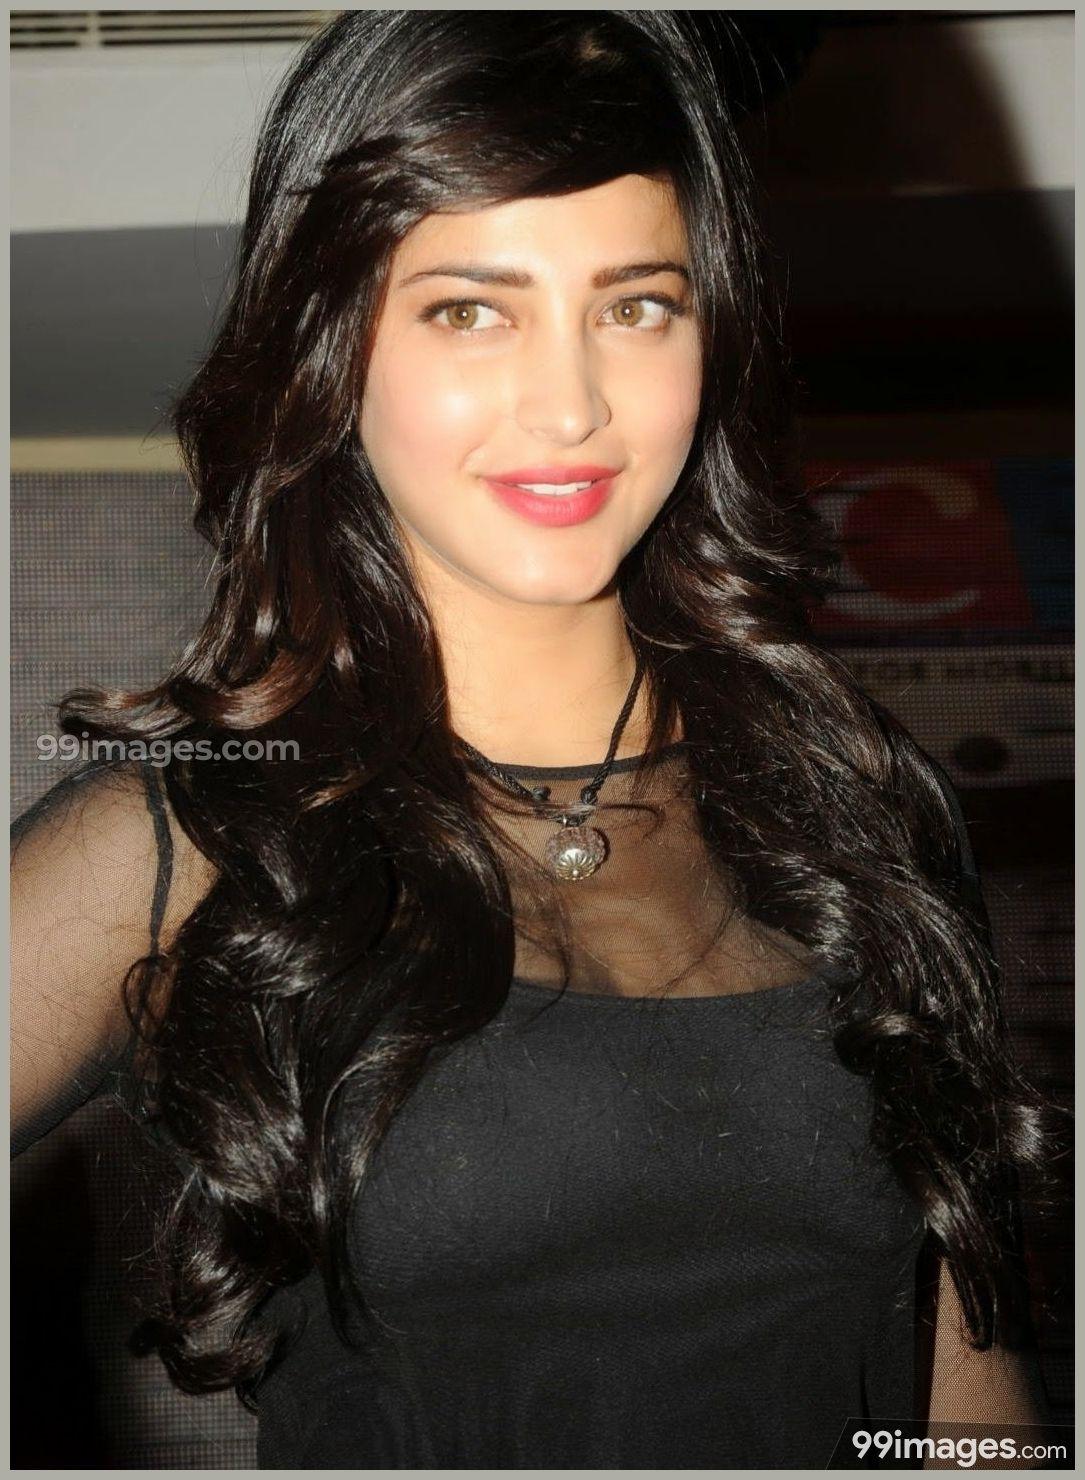 Shruti Haasan Beautiful Hd Photoshoot Stills 1080p 3620